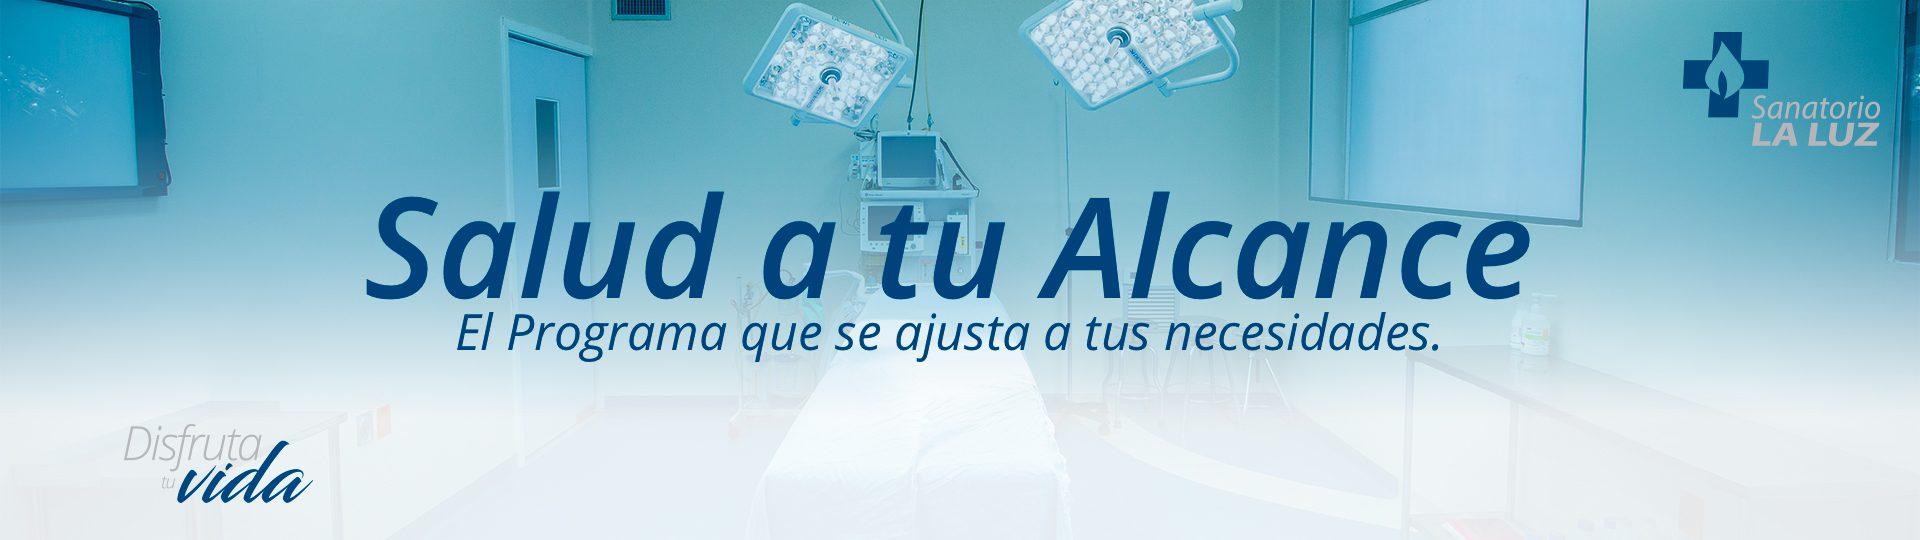 http://www.sanatoriolaluz.mx//wp-content/uploads/2018/01/Salud-a-tu-Alcance-Header-1920x540.jpg